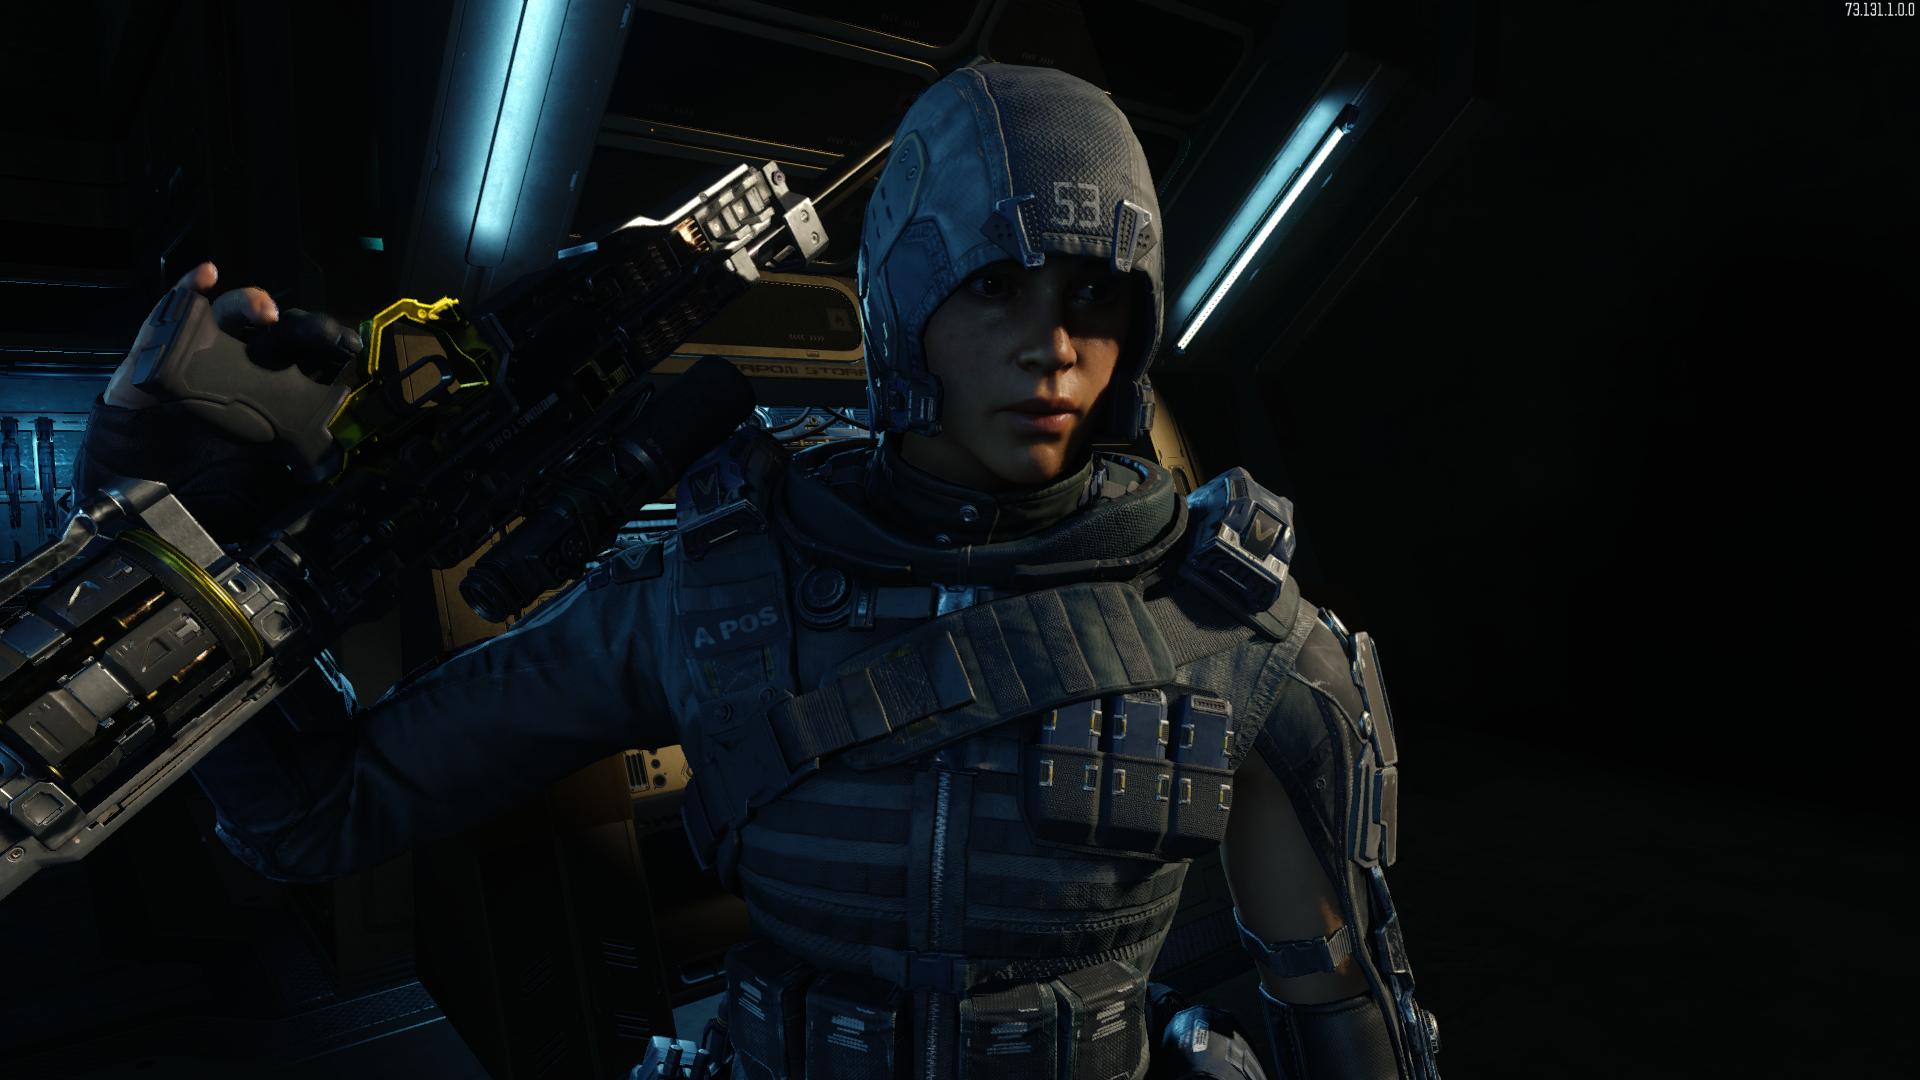 outrider-0540-headshot